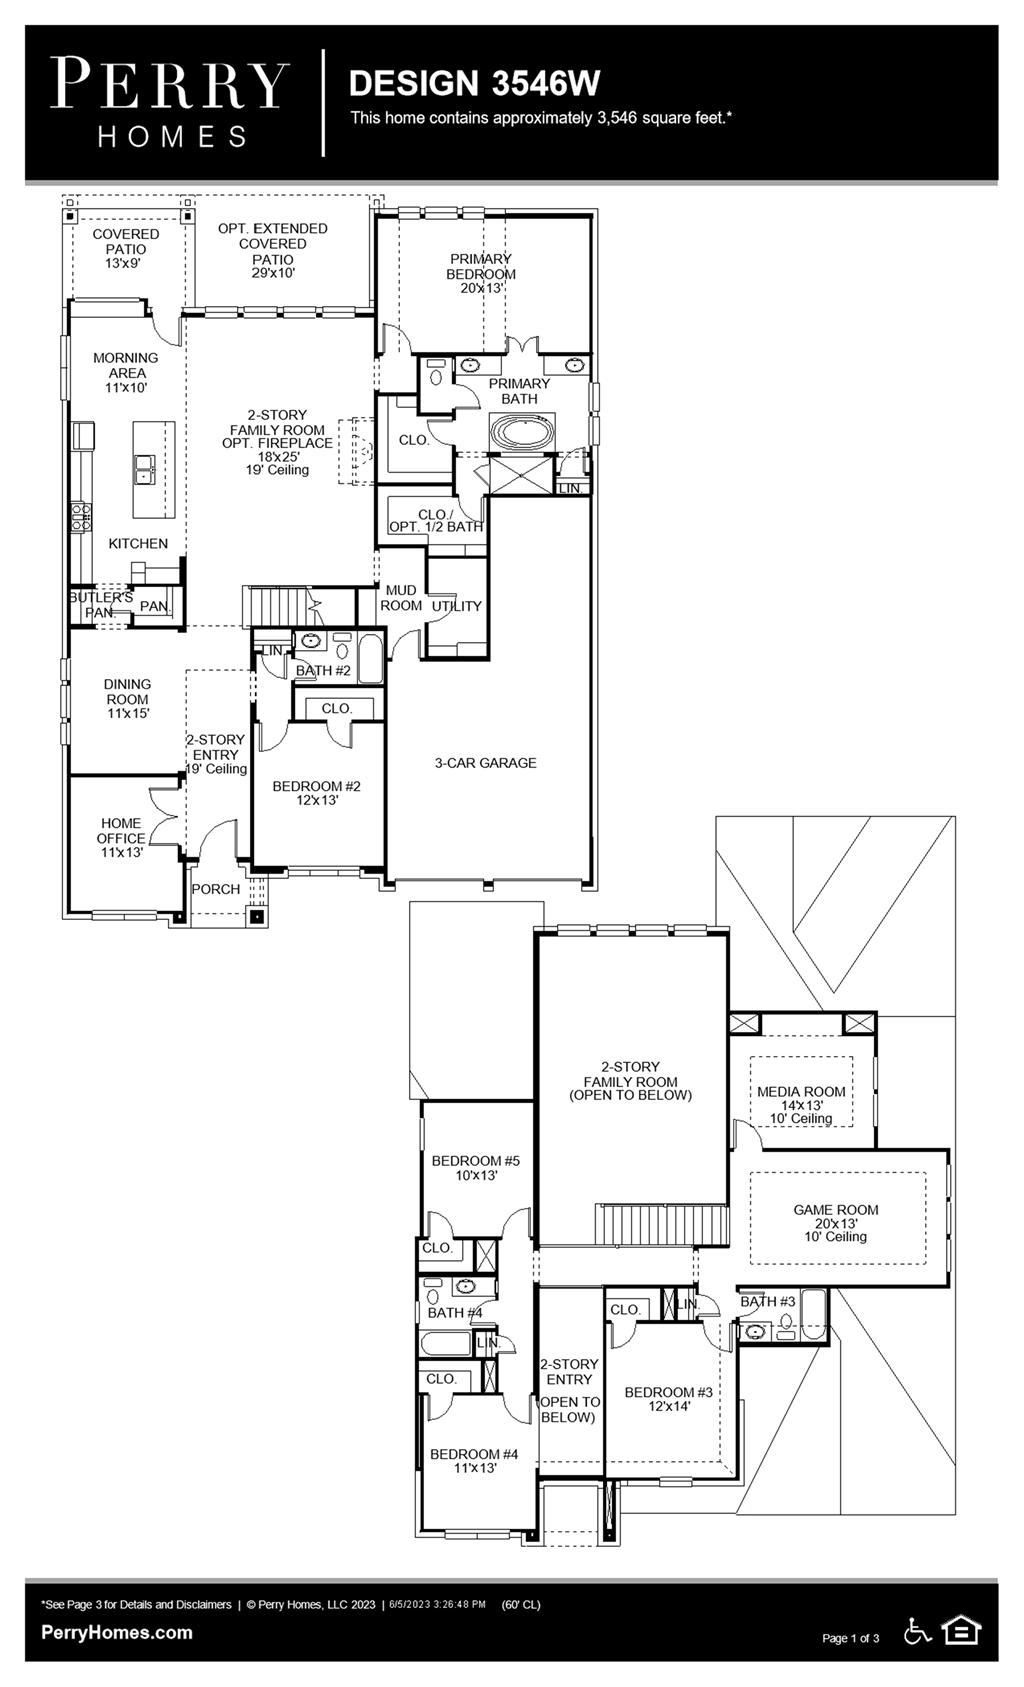 Floor Plan for 3546W